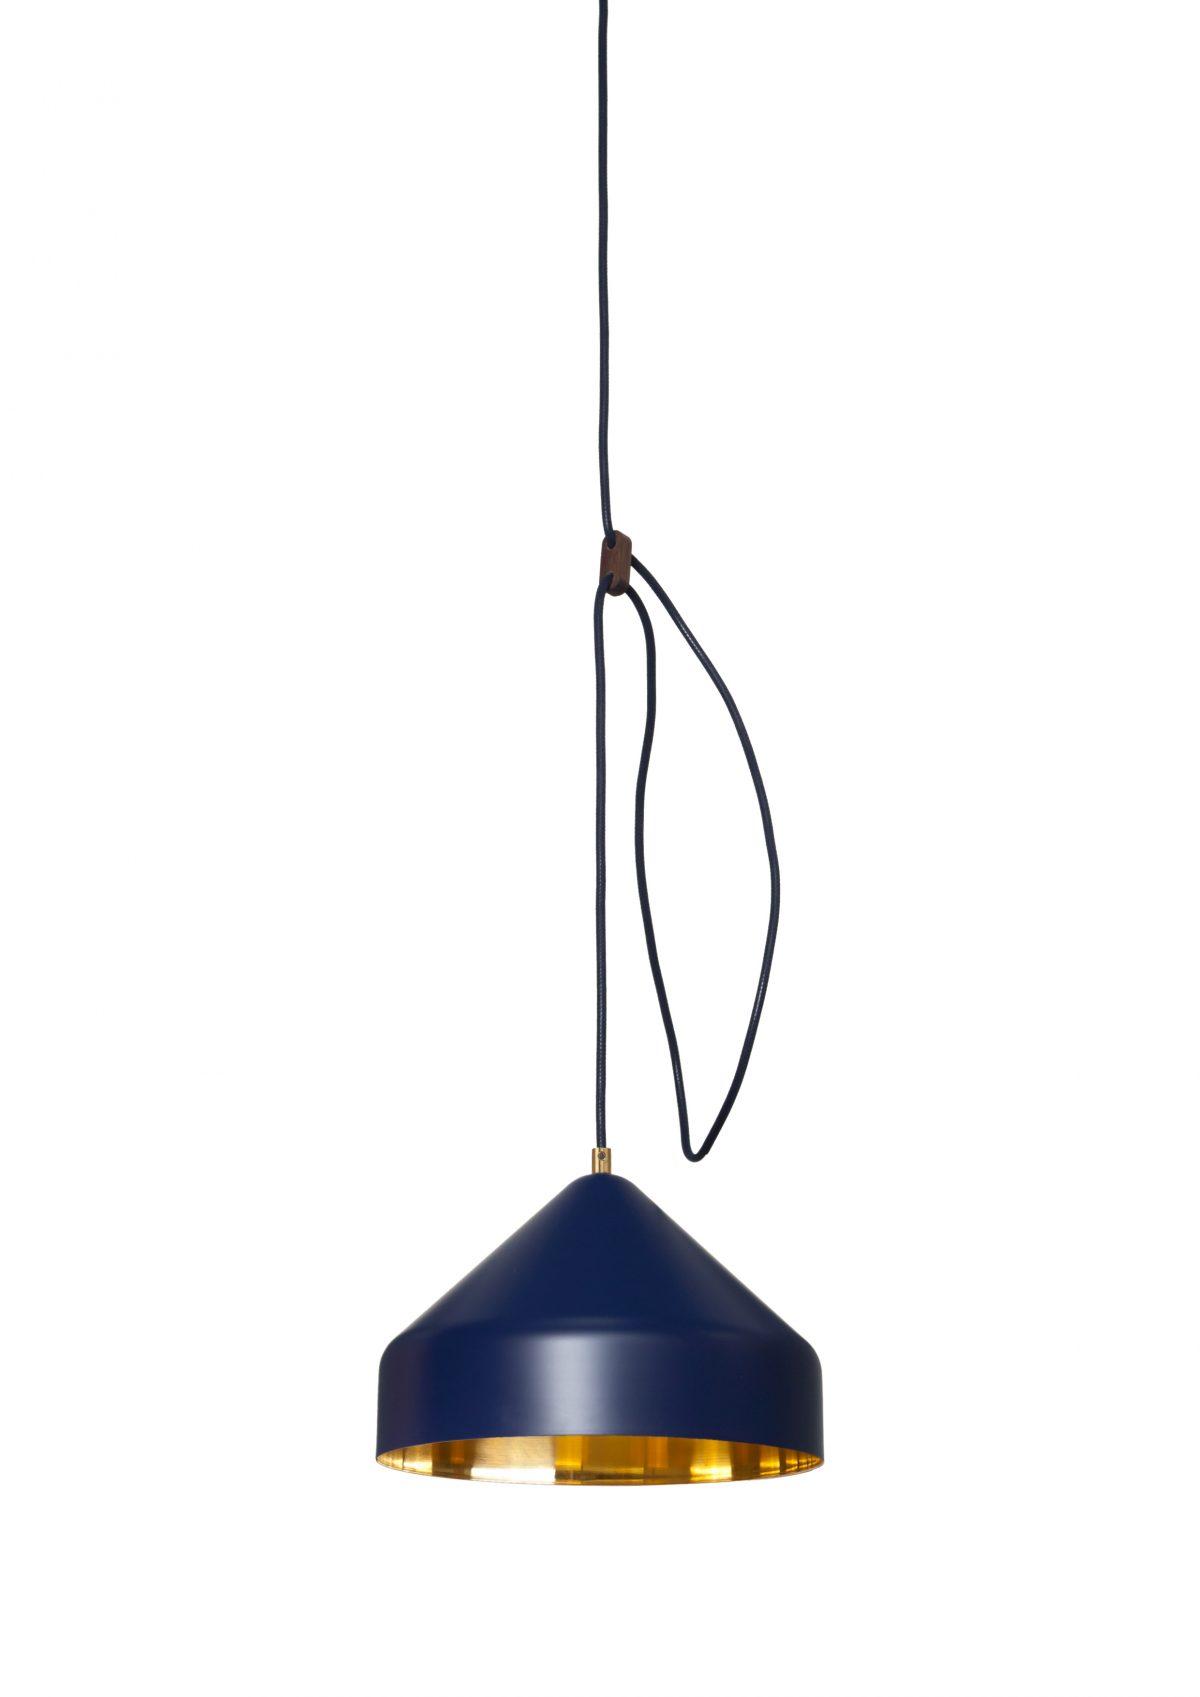 Lloop brass blue NCS7119-R75B Llus donkerblauw messing Vij5 – Gimmii